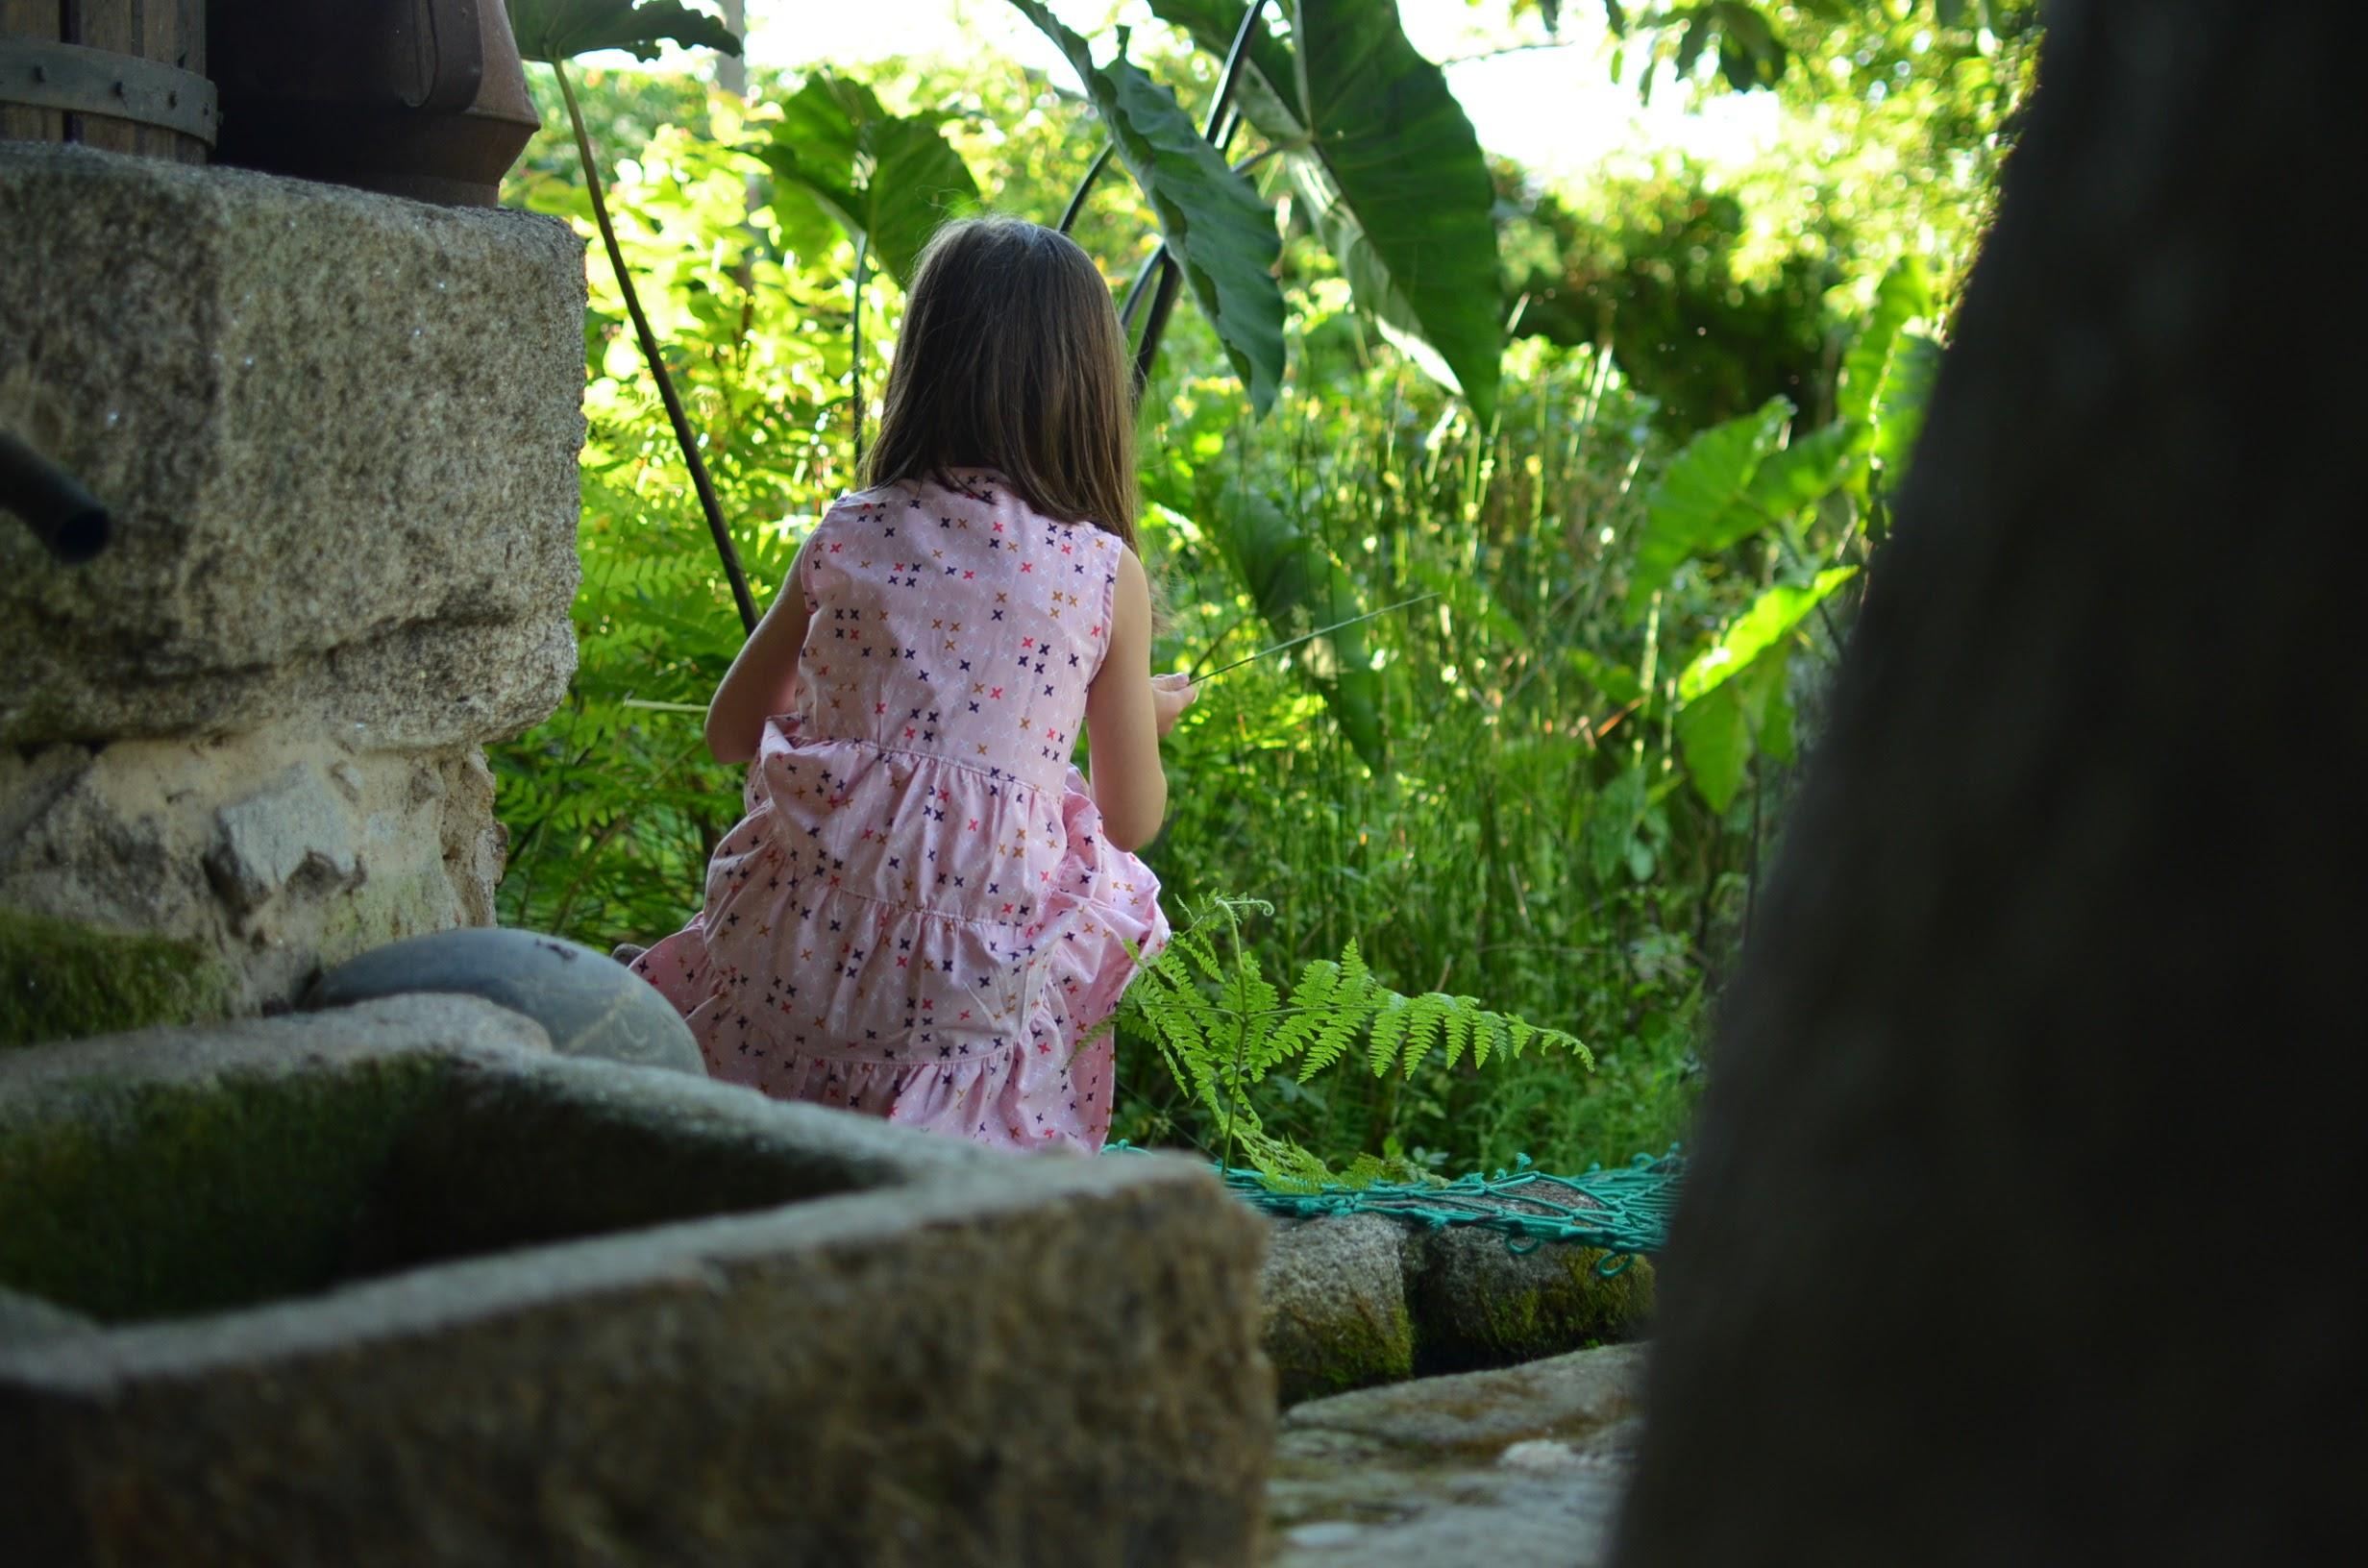 Inspirate en verano con Mamemimo y Diario de Naii